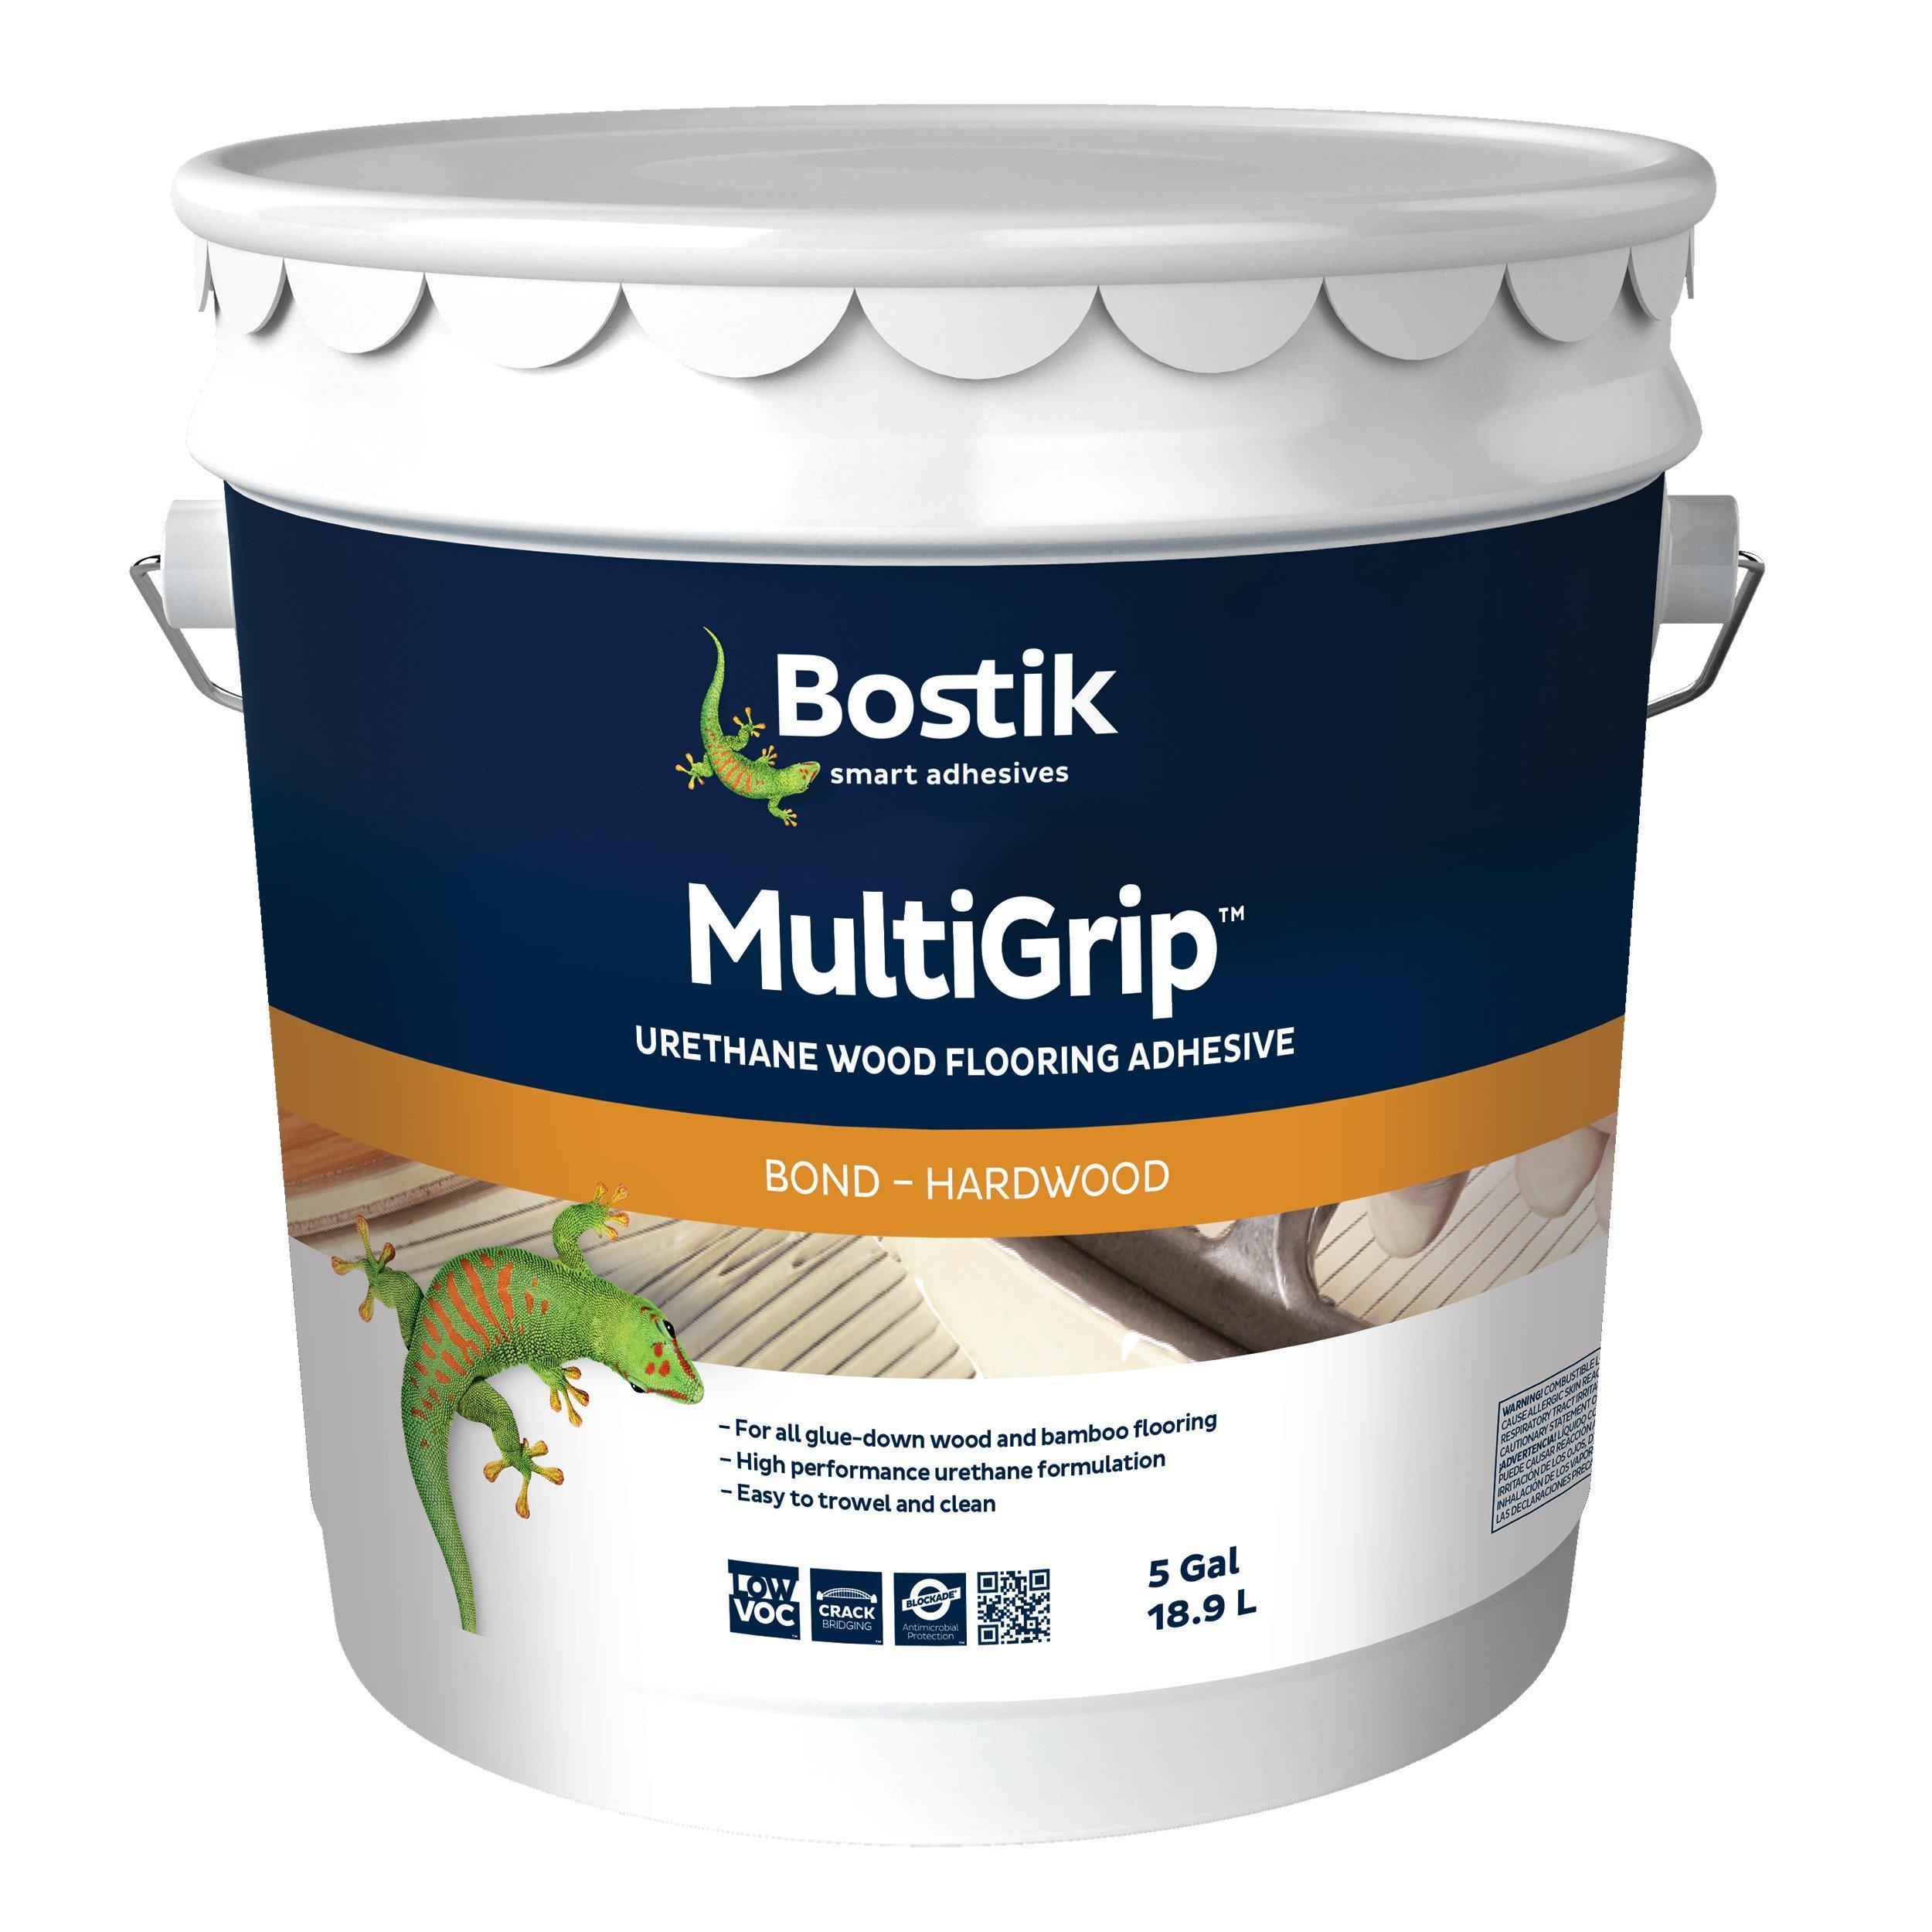 Bostik MultiGrip Urethane Wood Flooring Adhesive   5gal.   951100102 | Floor  And Decor